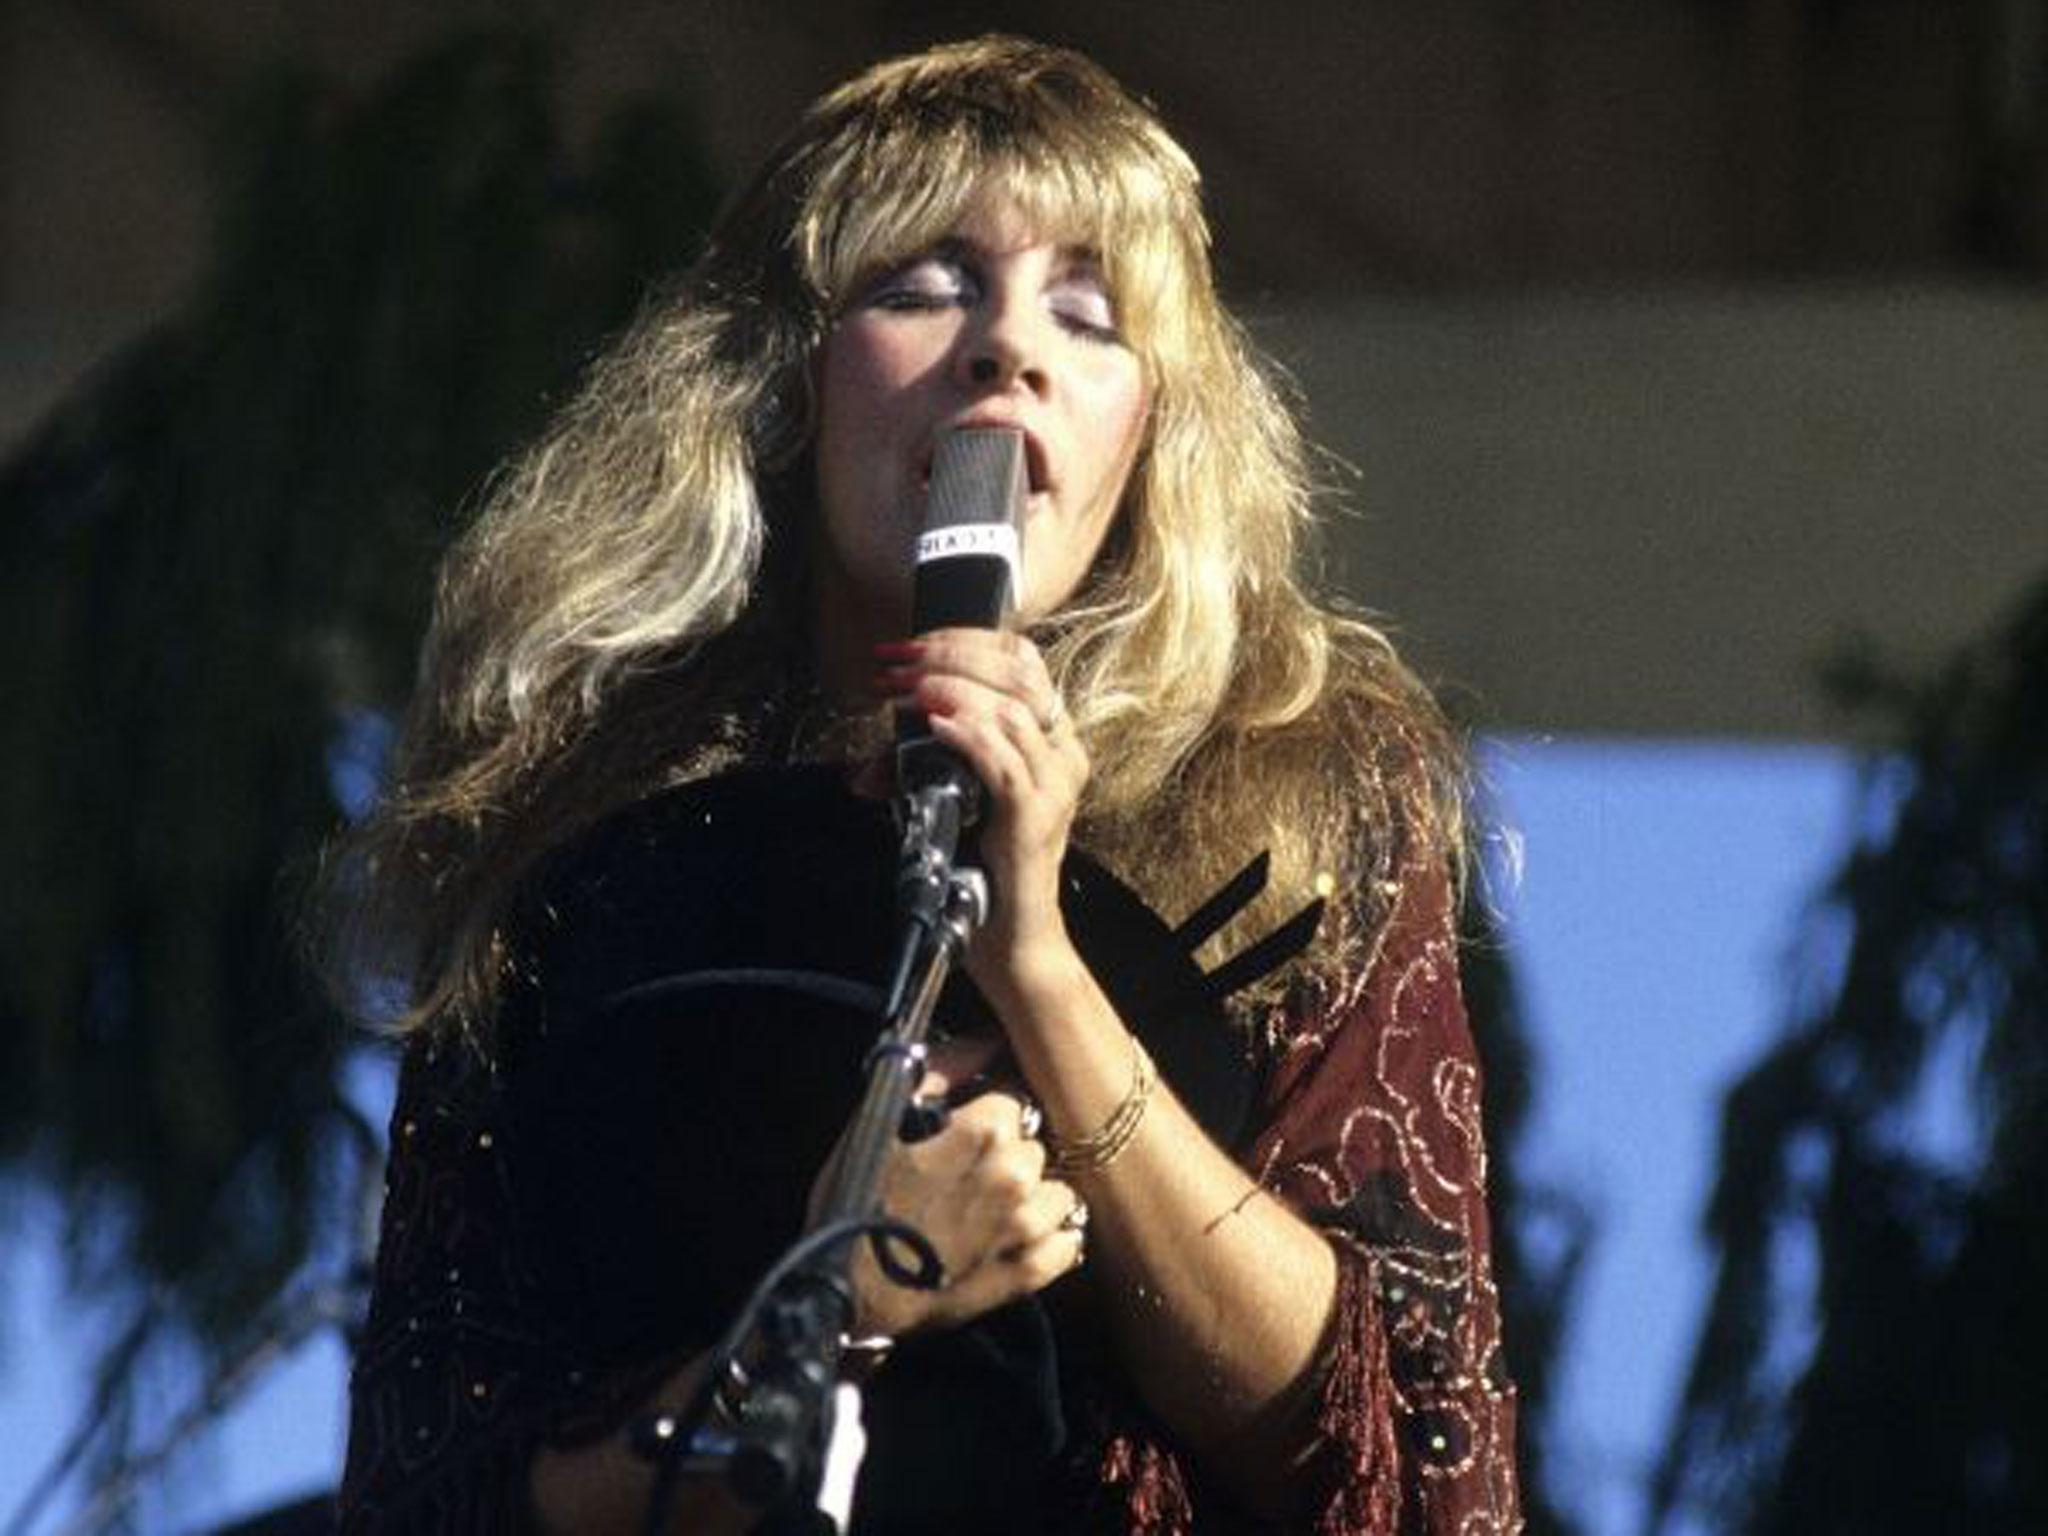 Return of the Mac: Fleetwood Mac's 20 greatest songs